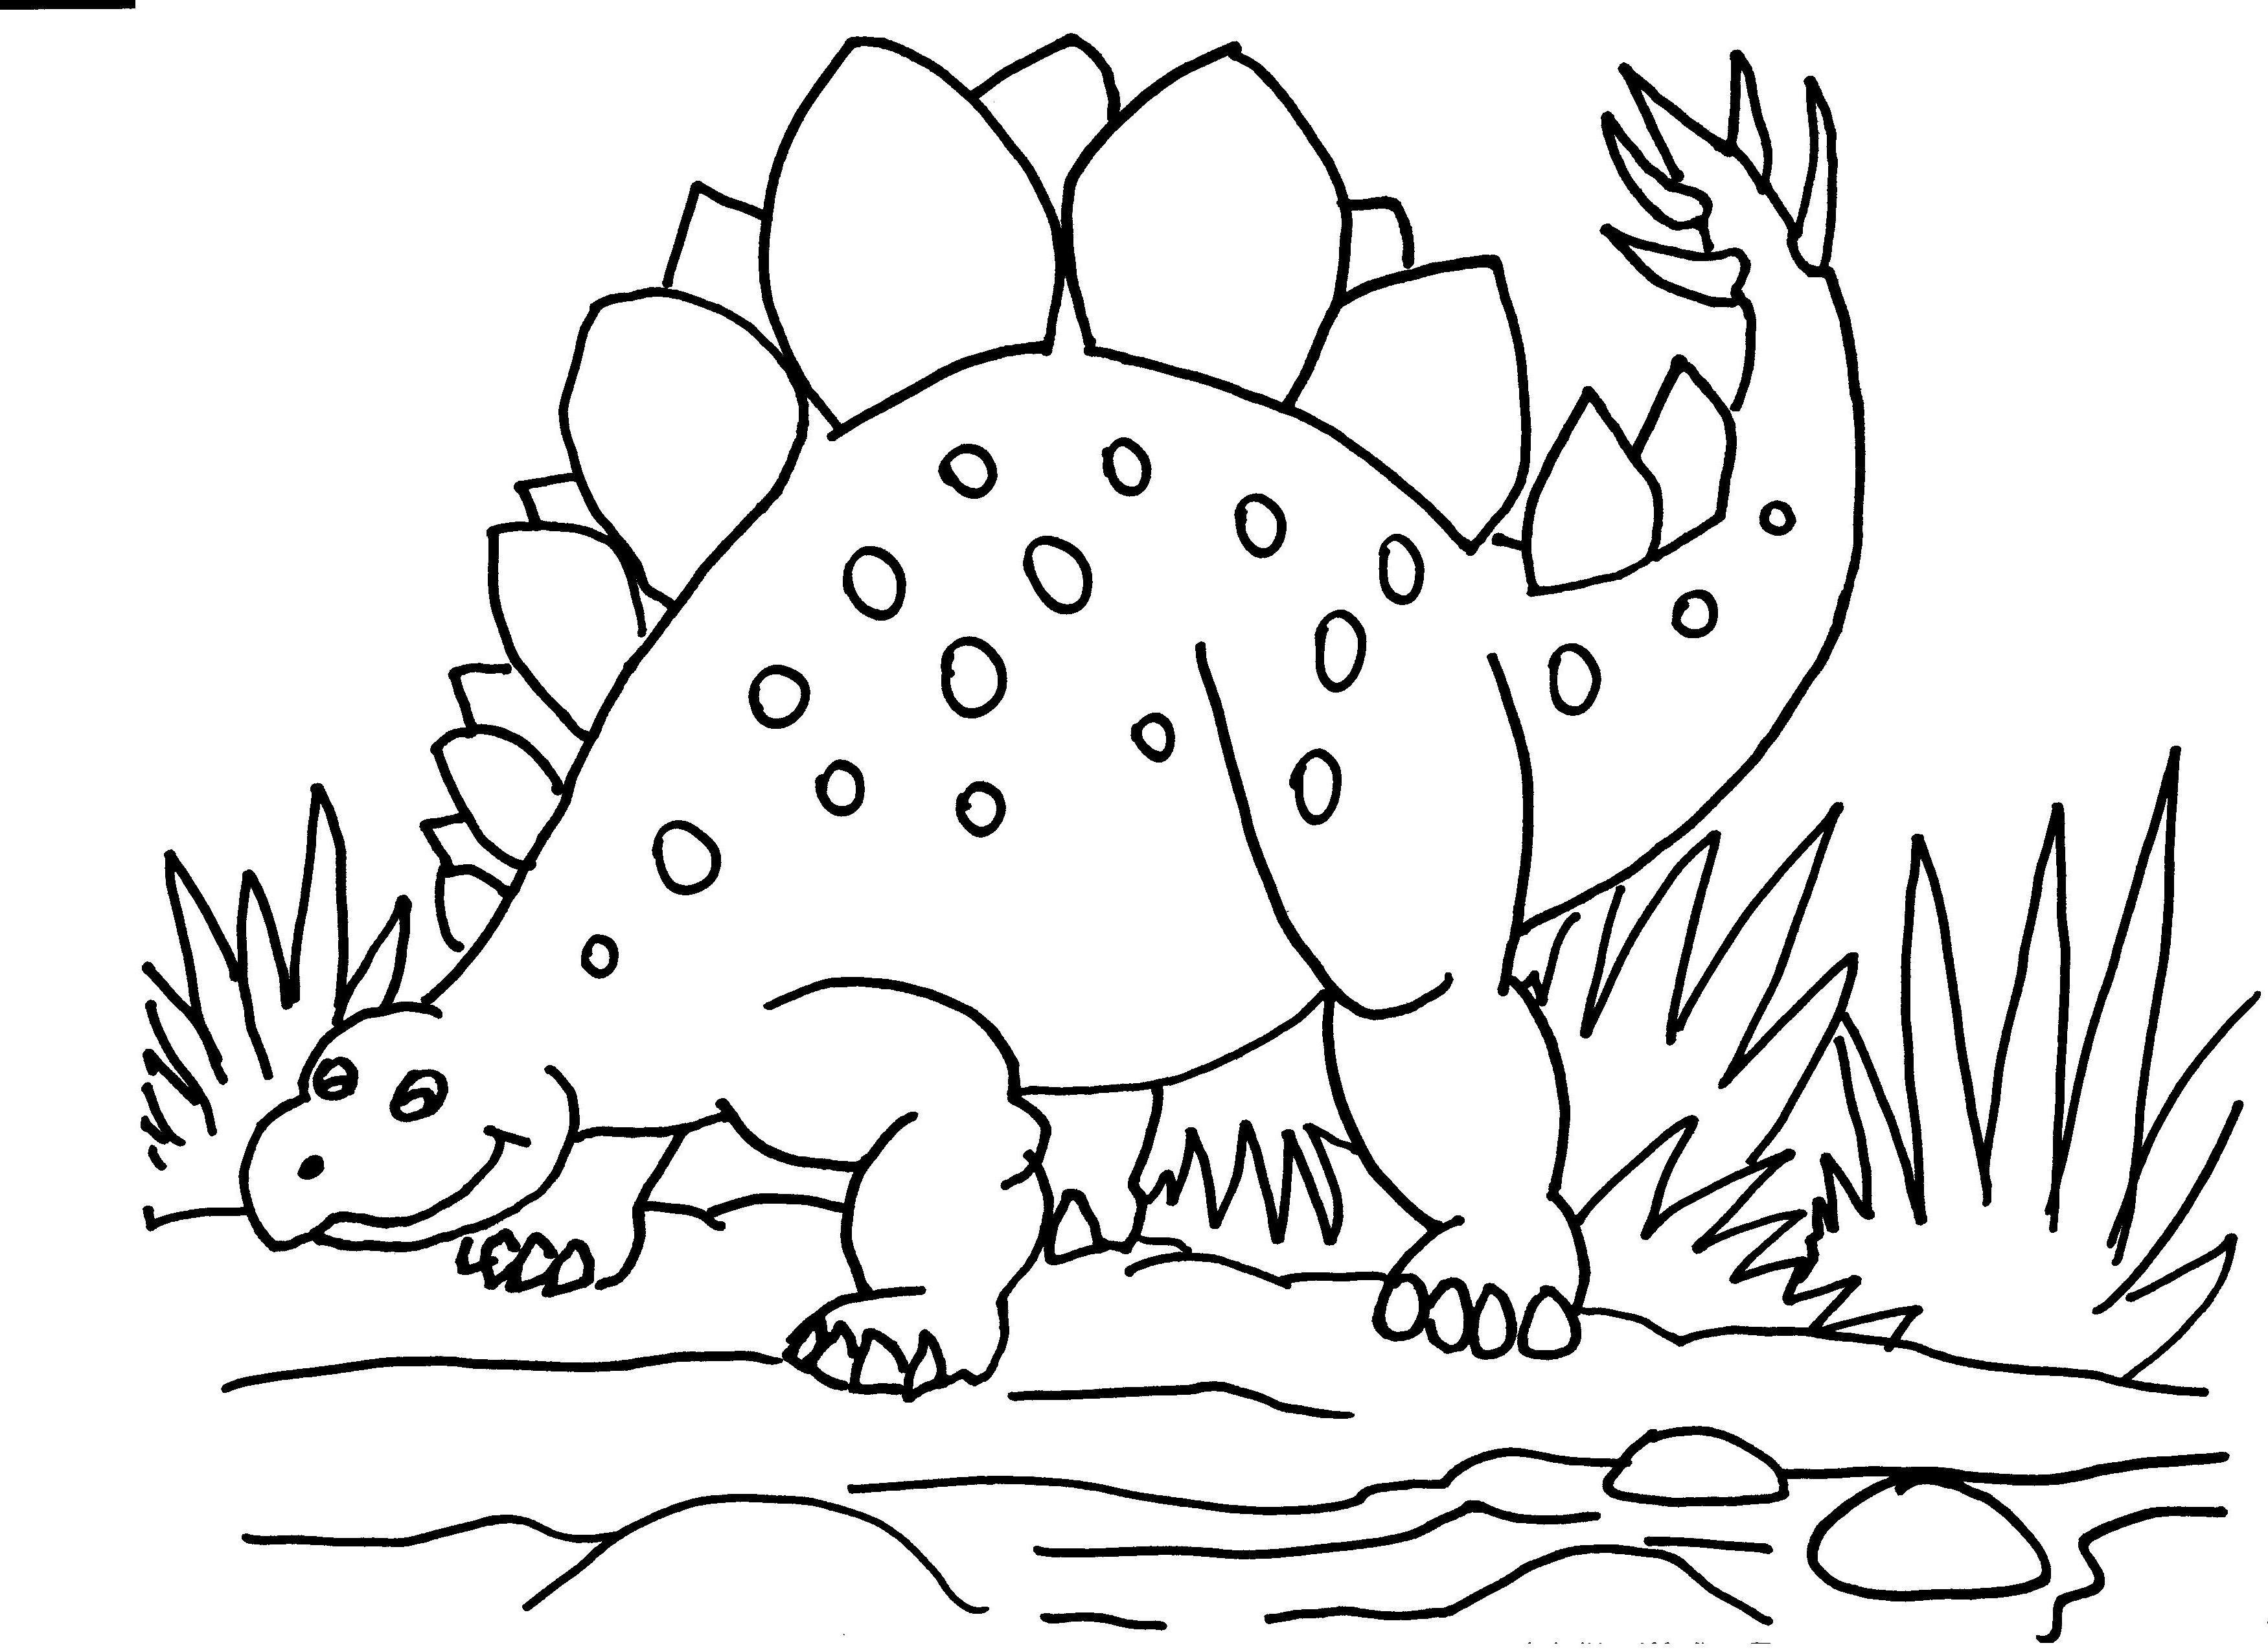 dibujos para colorear de dinosaurios para infantil - Yahoo Image ...